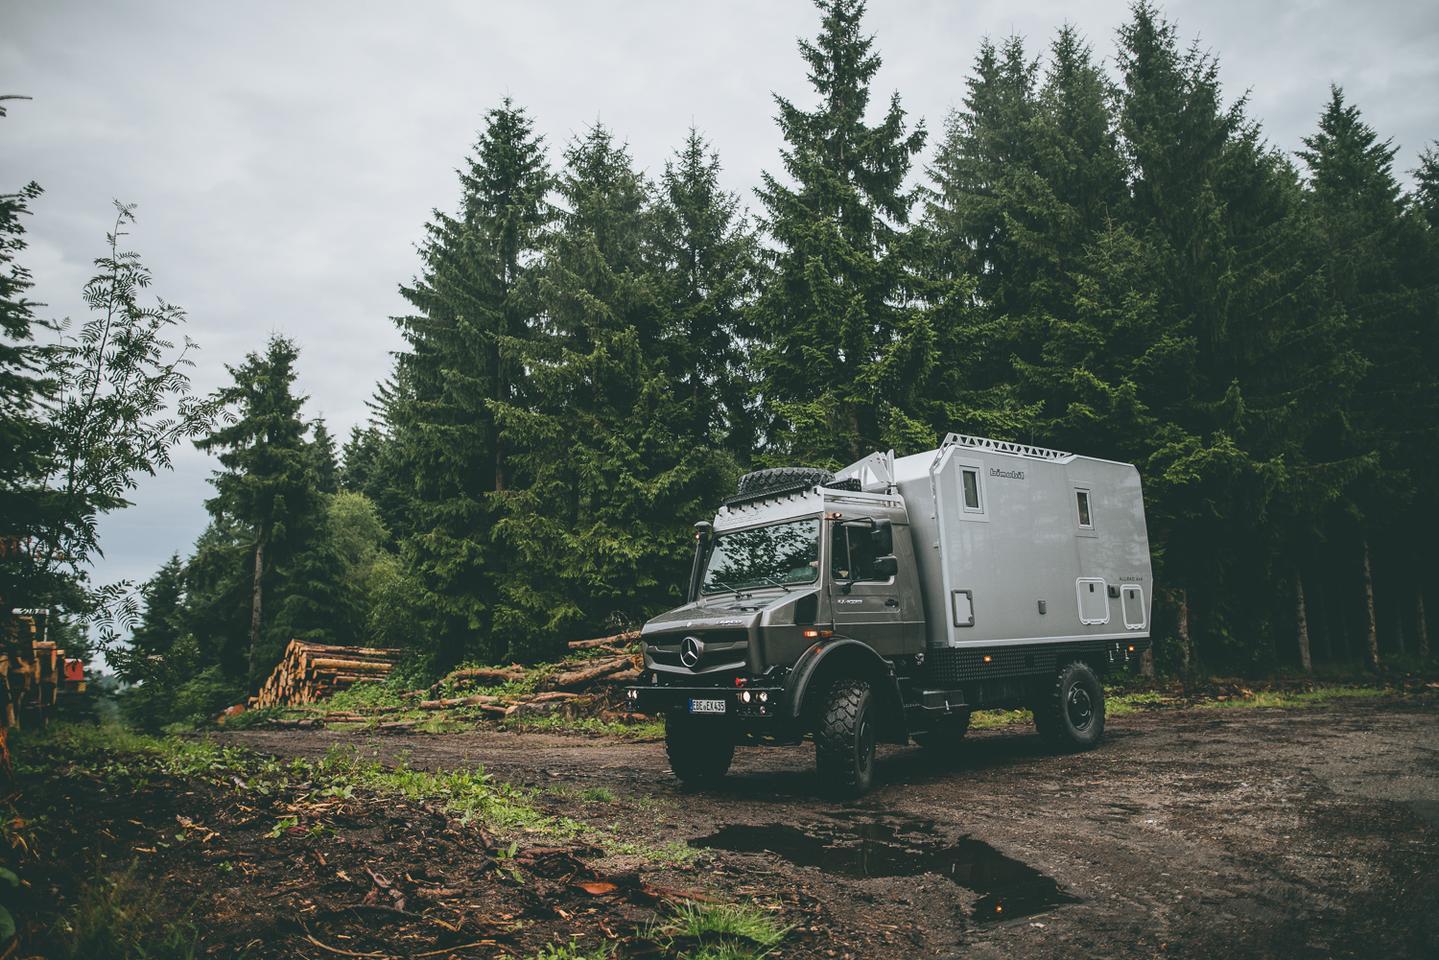 Bimobil EX 435 puts Unimog muscle to work exploring the world